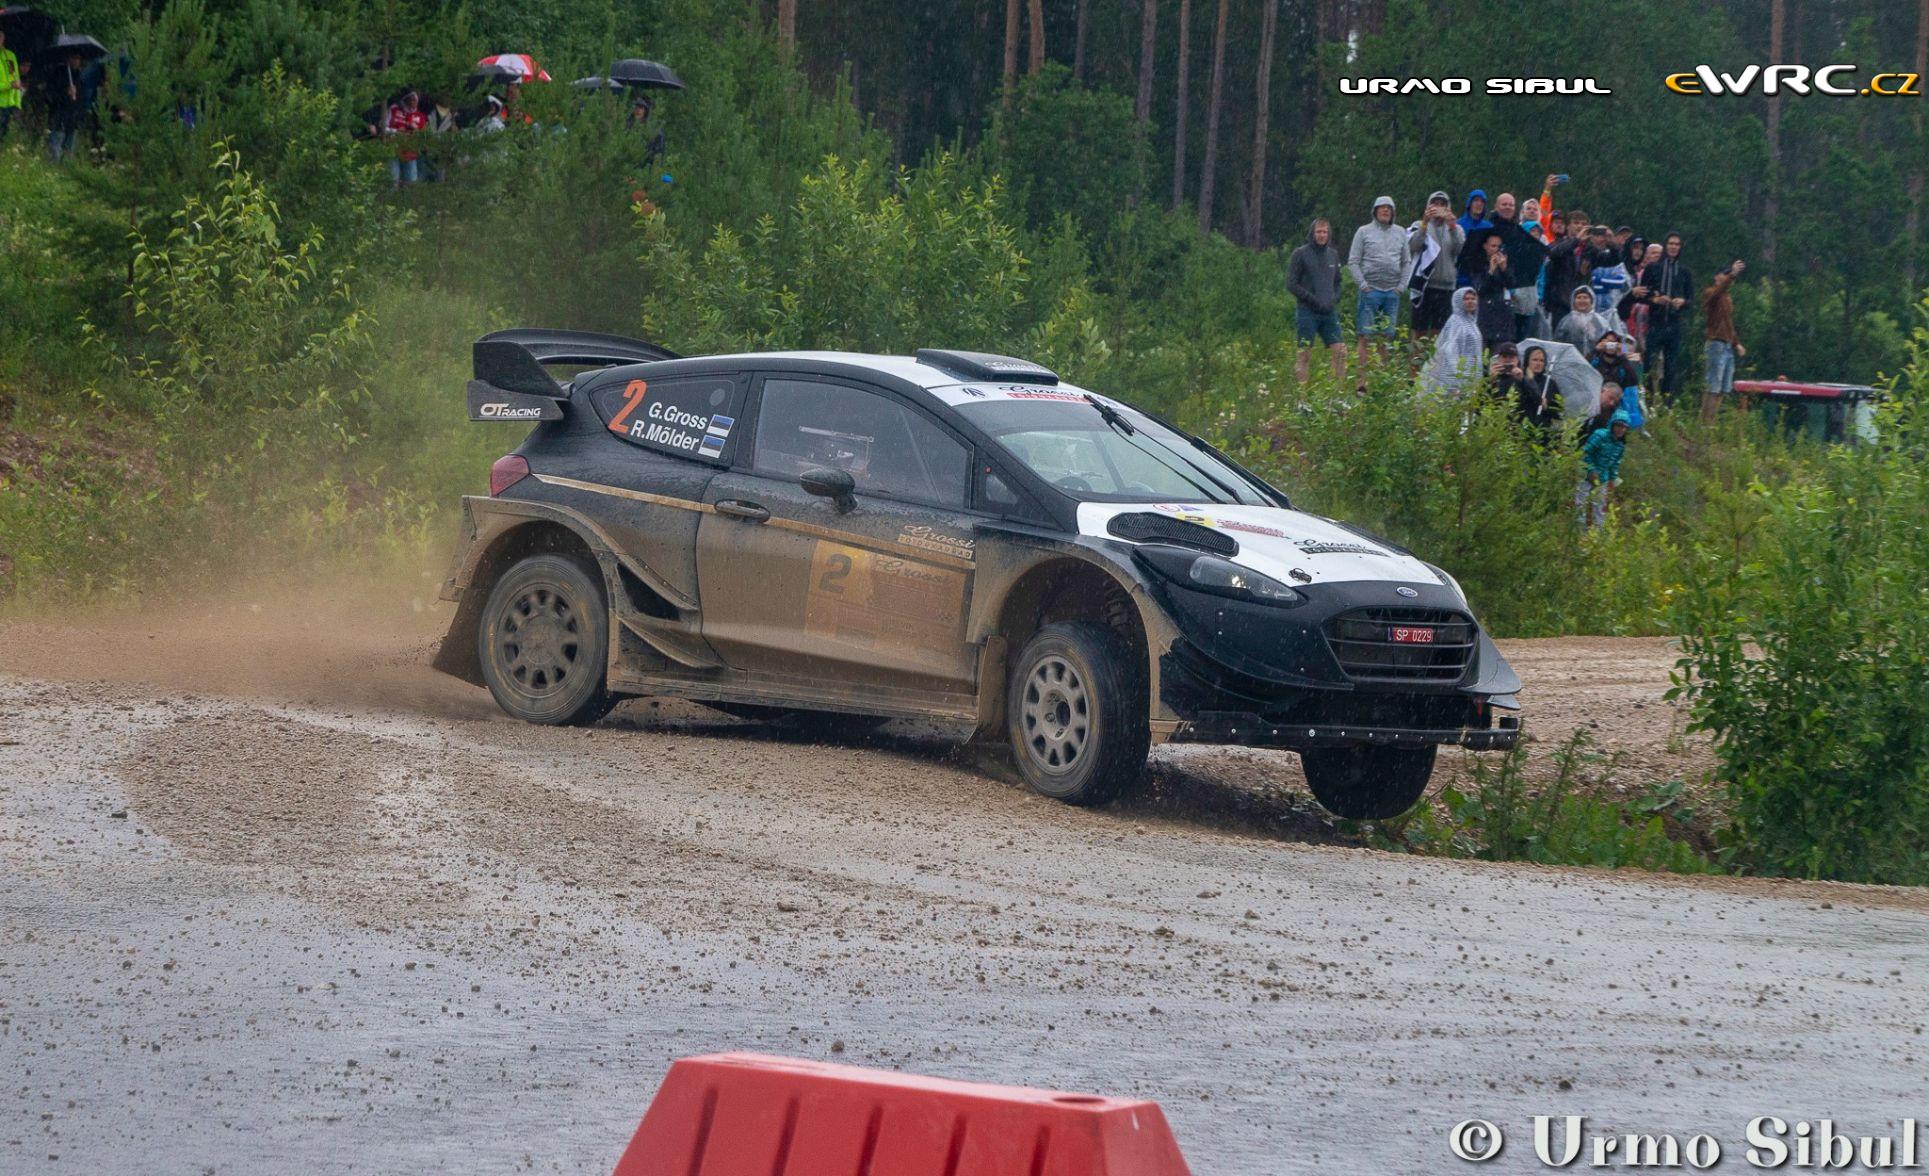 WRC: 10º Rallye Estonia [4-6 Septiembre] Usi_pg1_5801